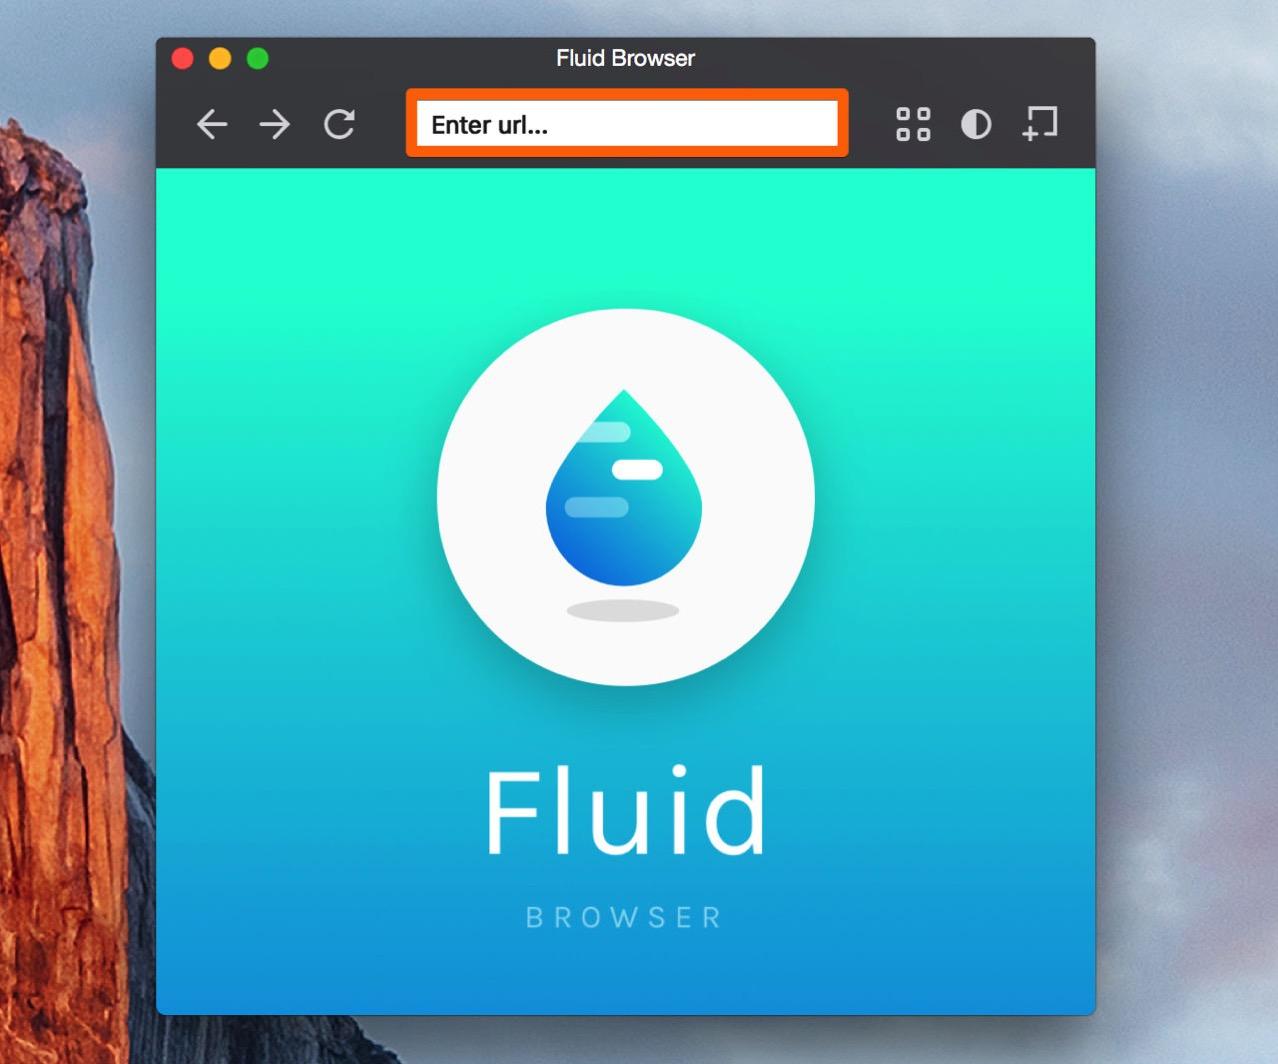 Fluid browser8